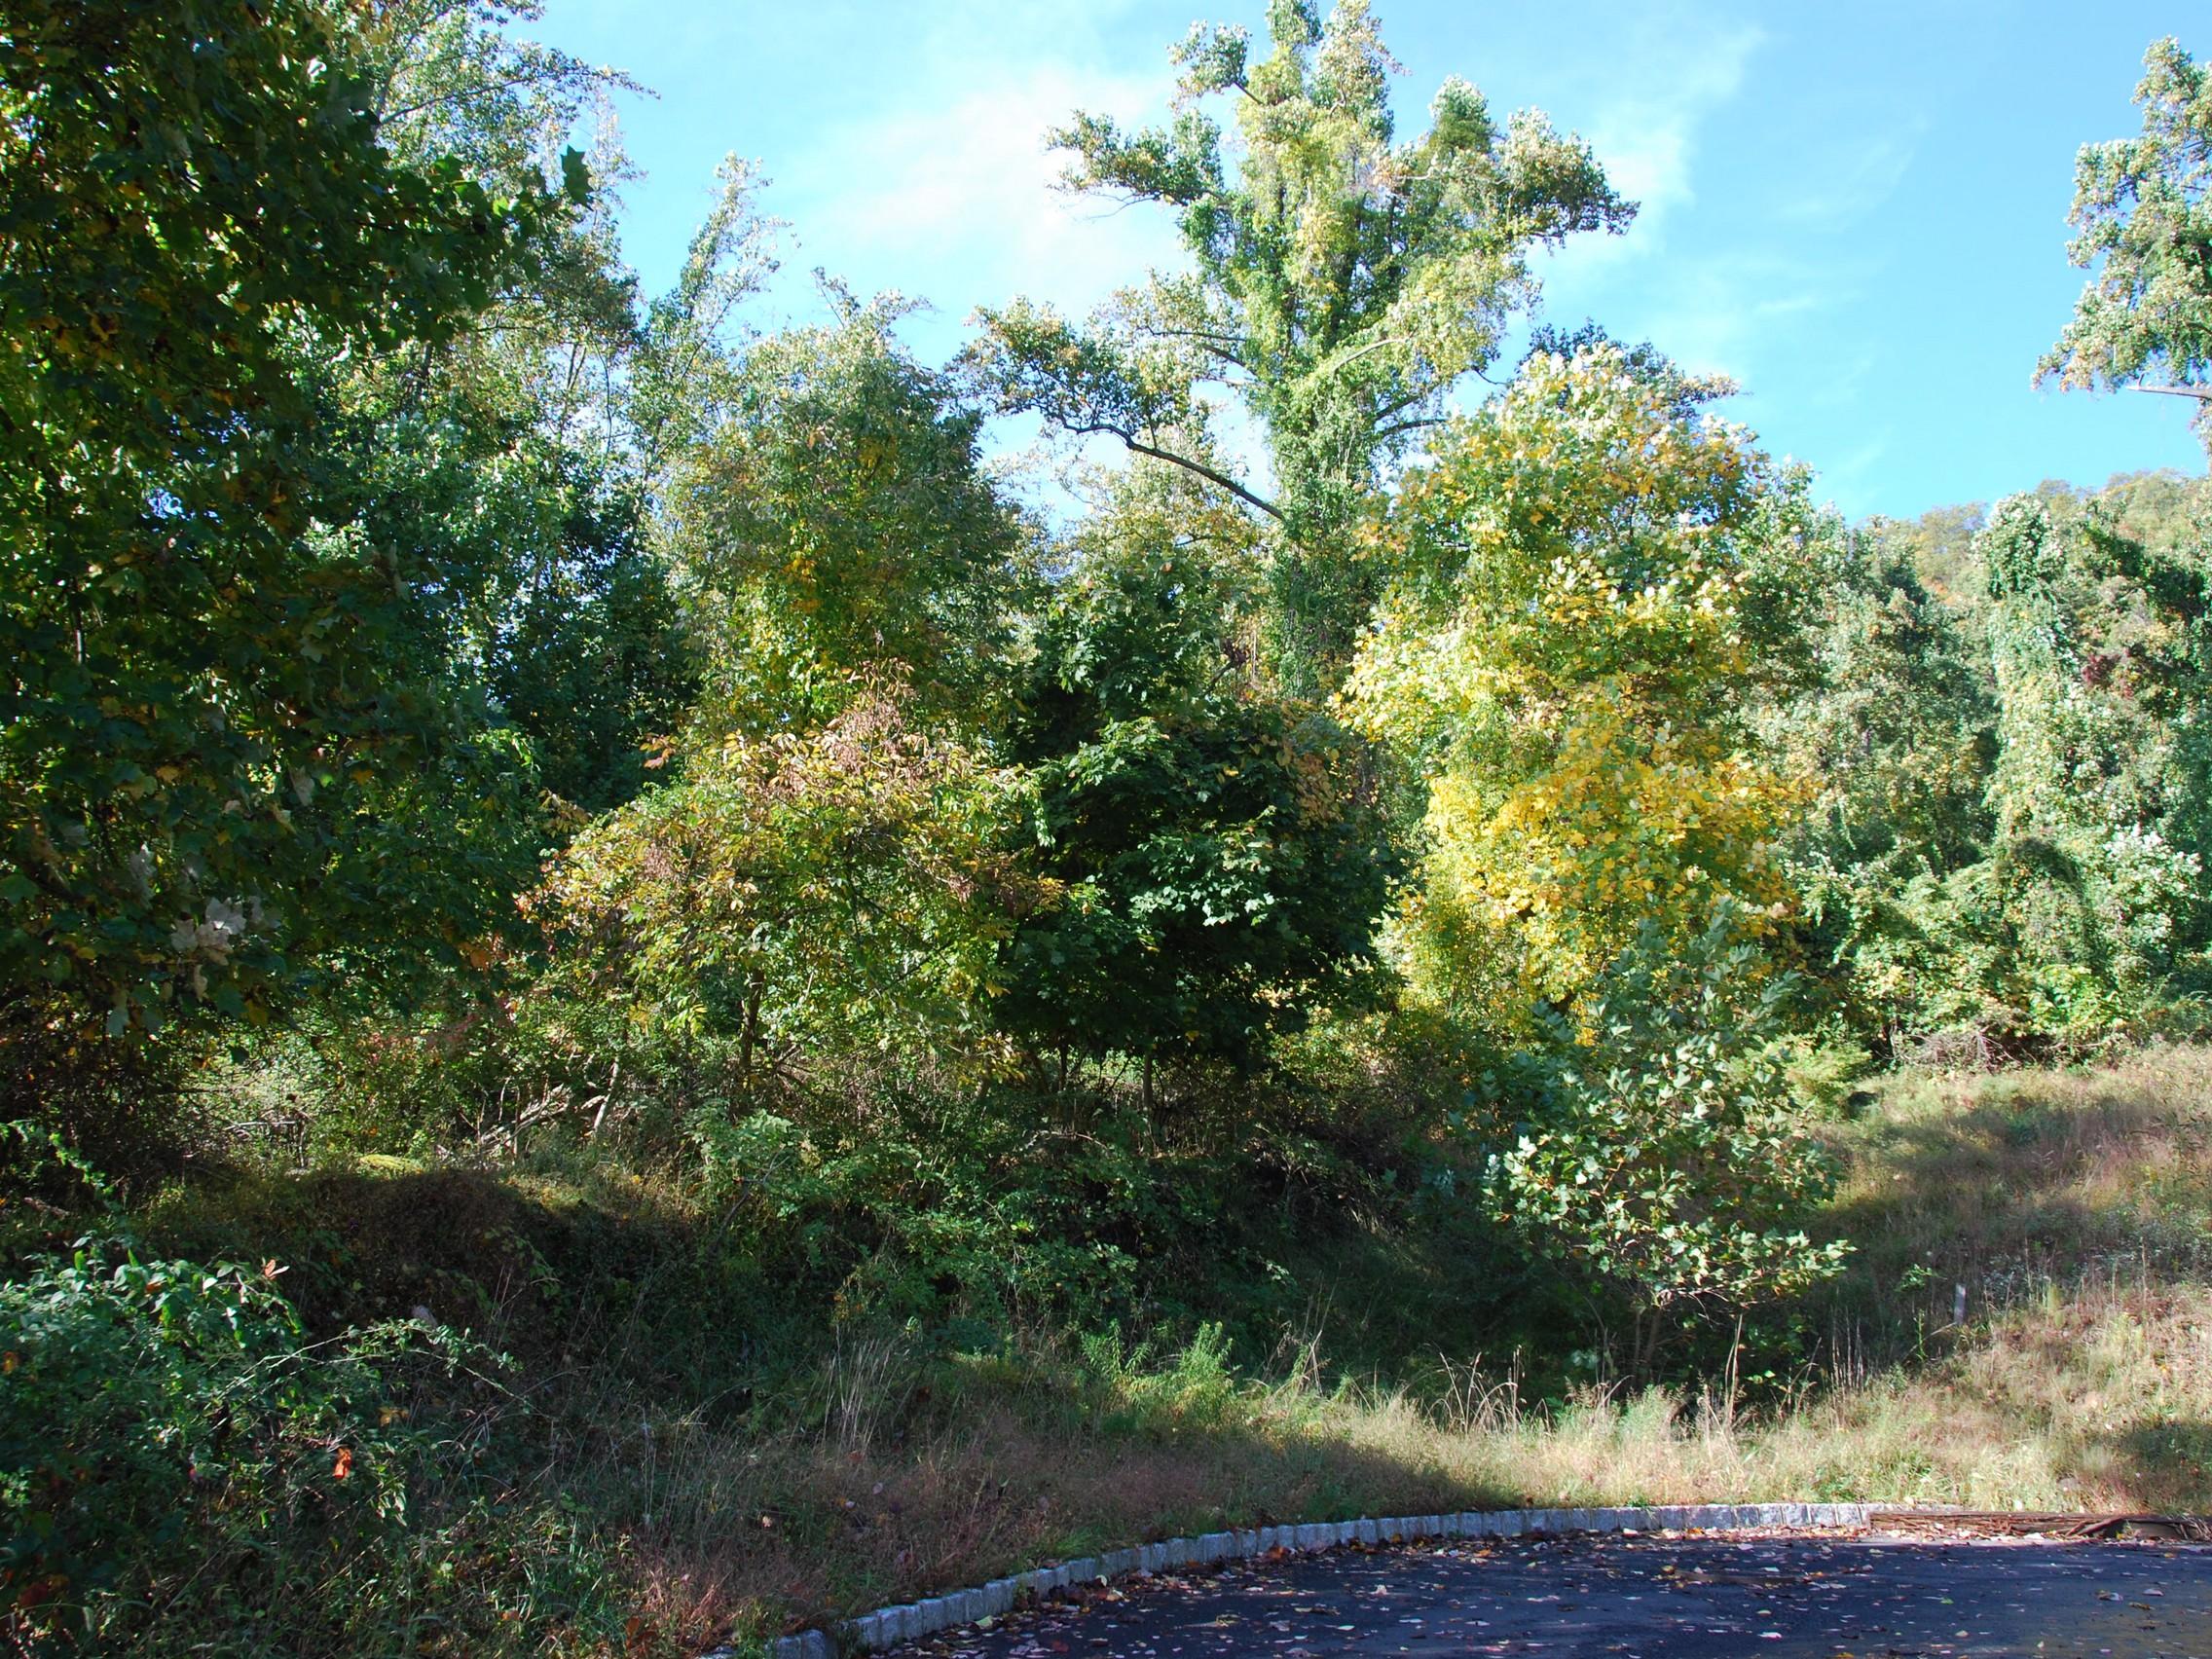 Land for Sale at 180 Degree Hudson River Views Tweed Blvd. Upper Grandview, New York 10960 United States